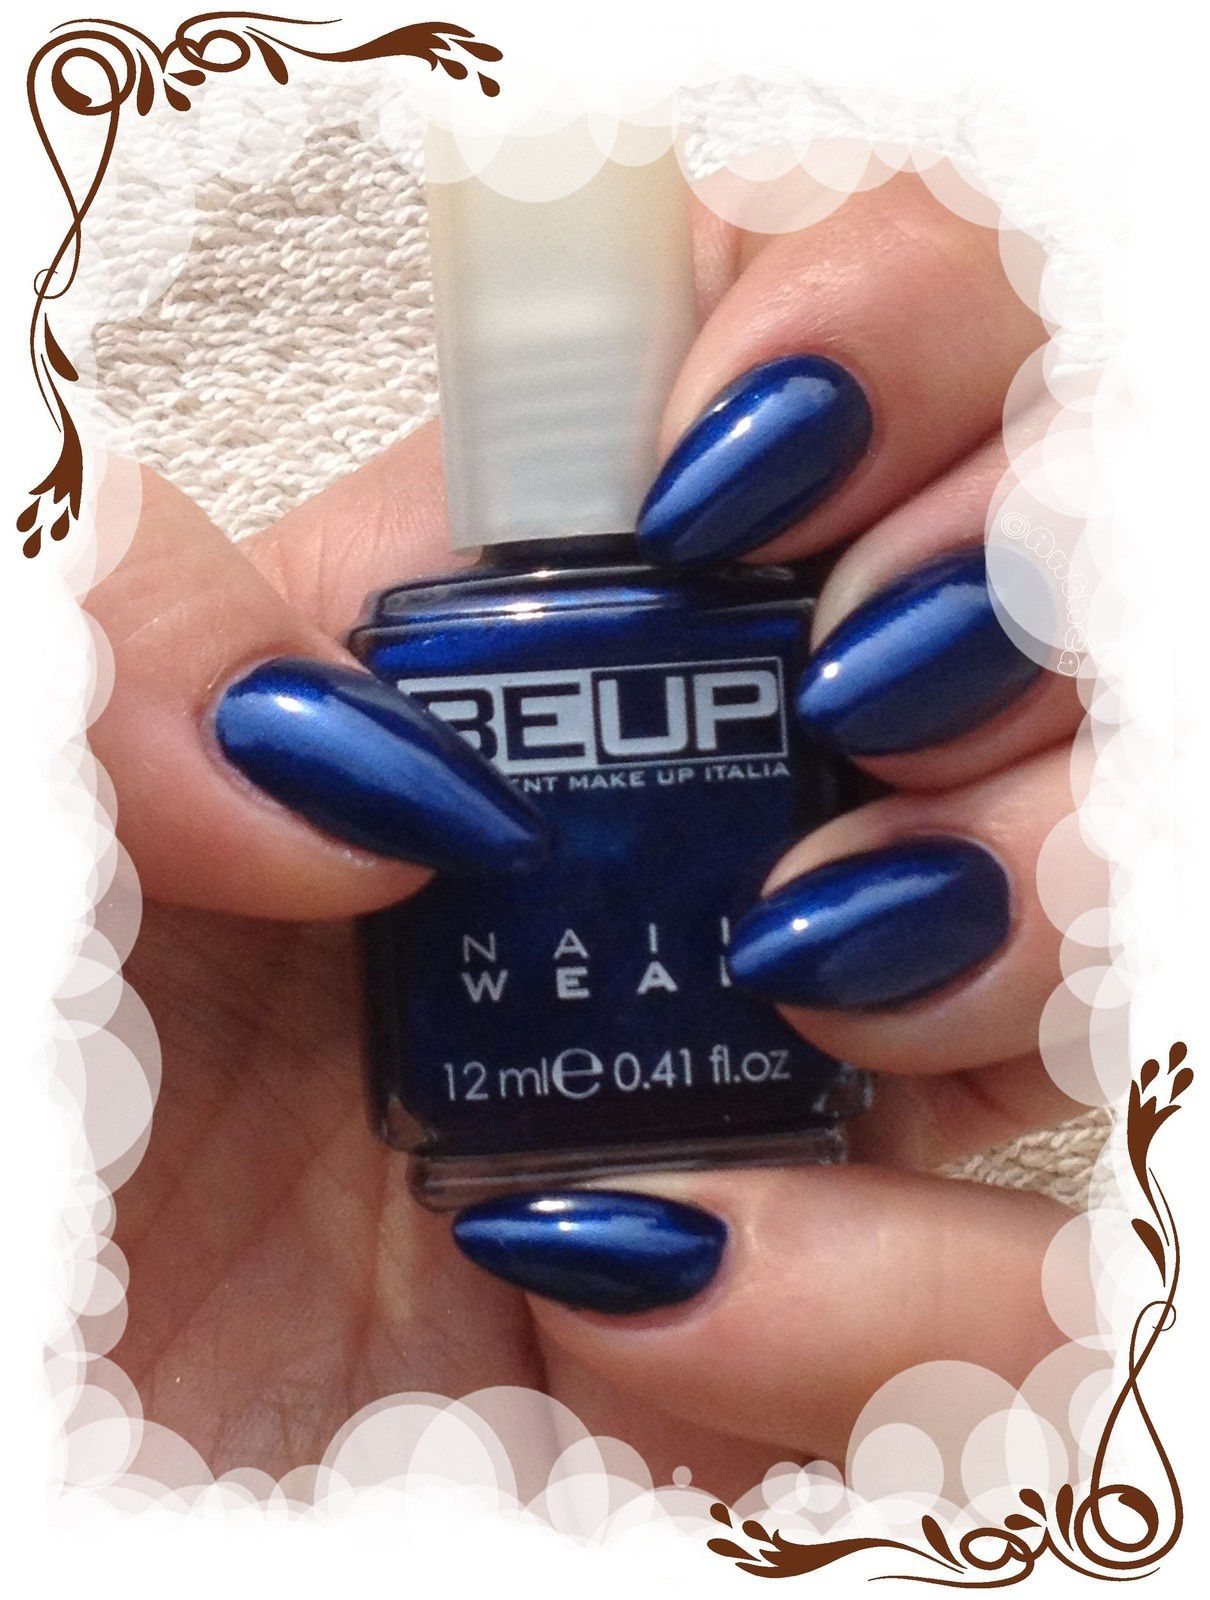 BEUP n°41 Nail wear